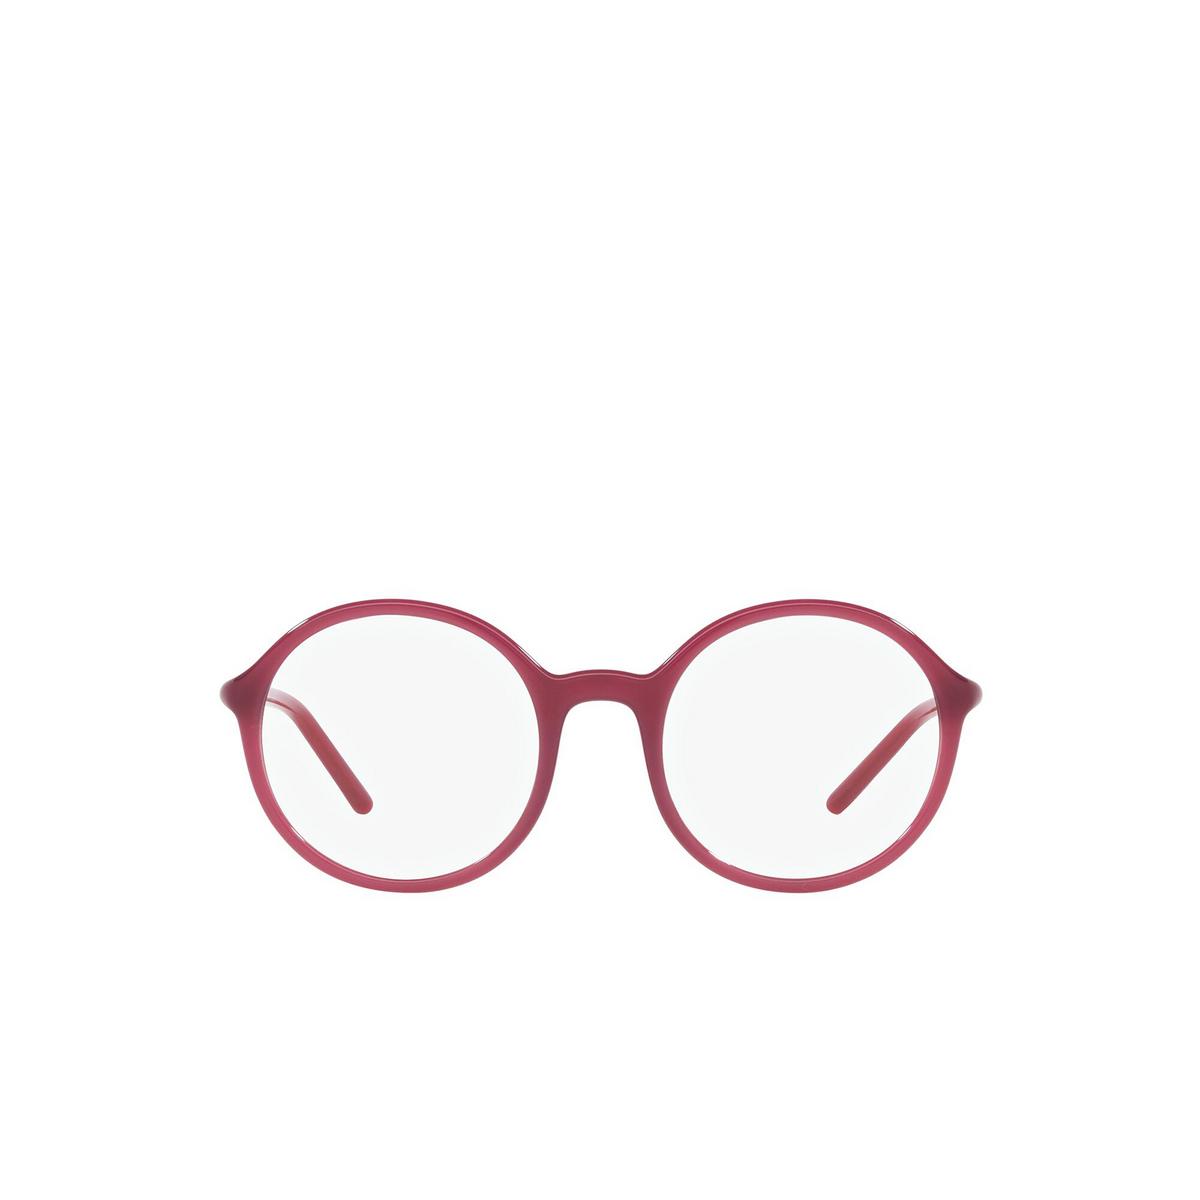 Prada® Round Eyeglasses: PR 09WV color Opal Bordeaux 2BM1O1 - front view.